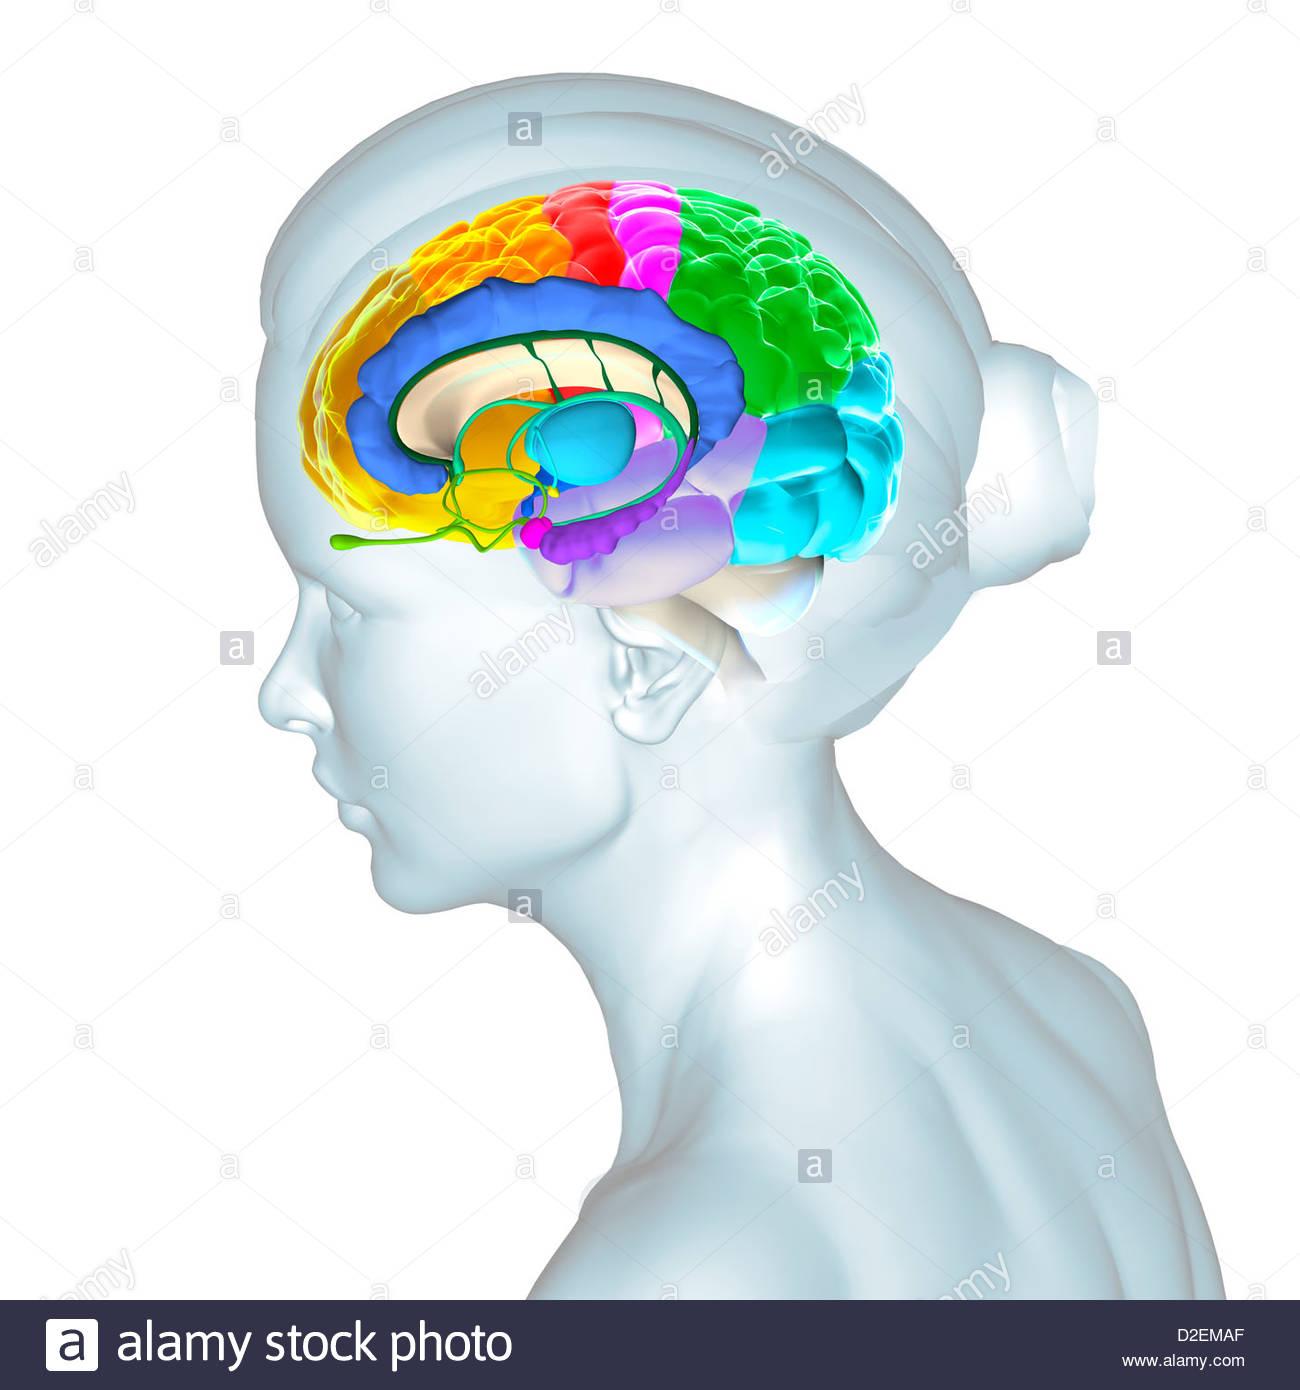 Gyri Of The Brain Stockfotos & Gyri Of The Brain Bilder - Alamy